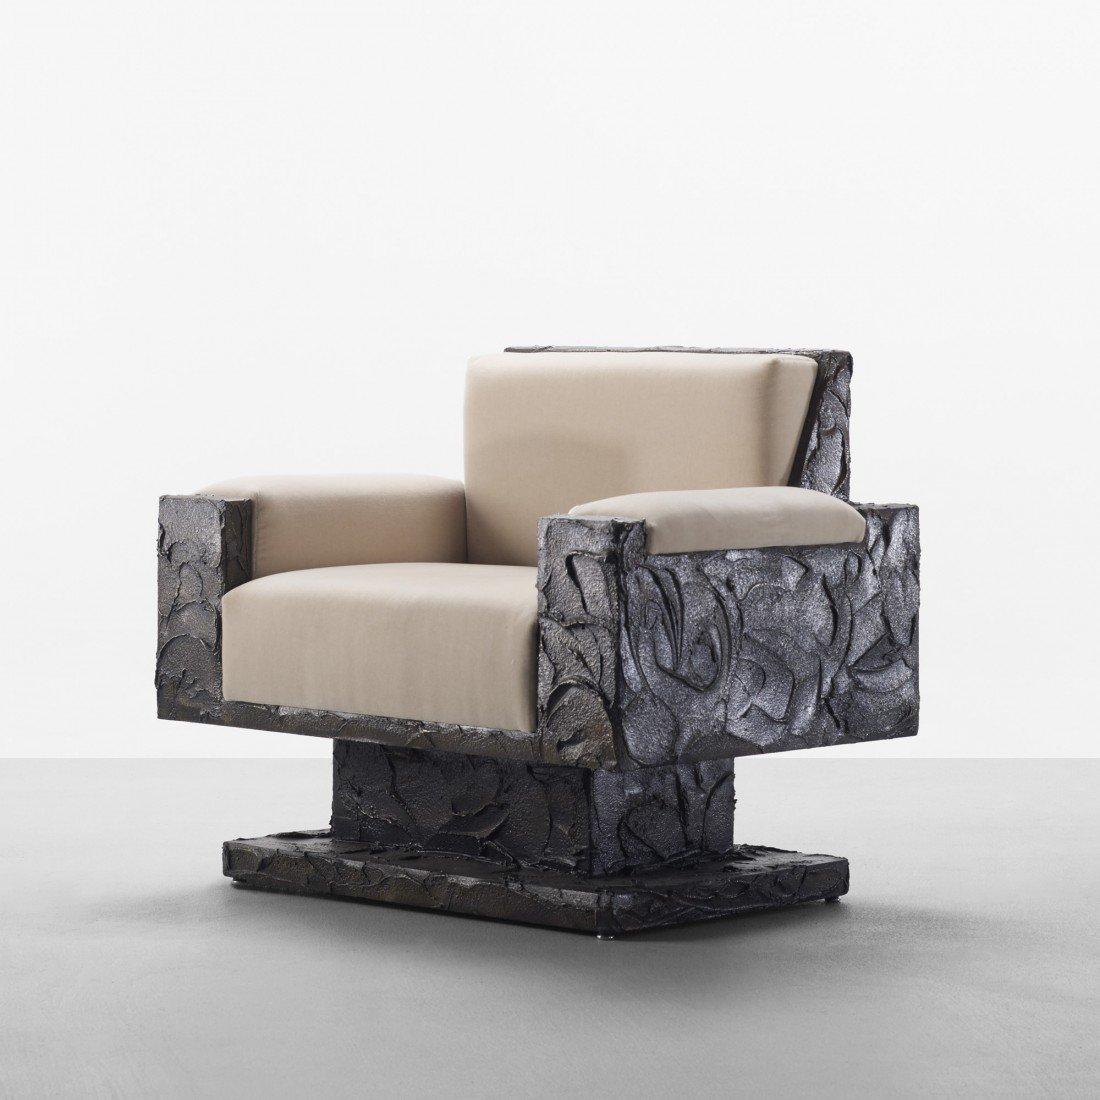 107: Paul Evans armchair